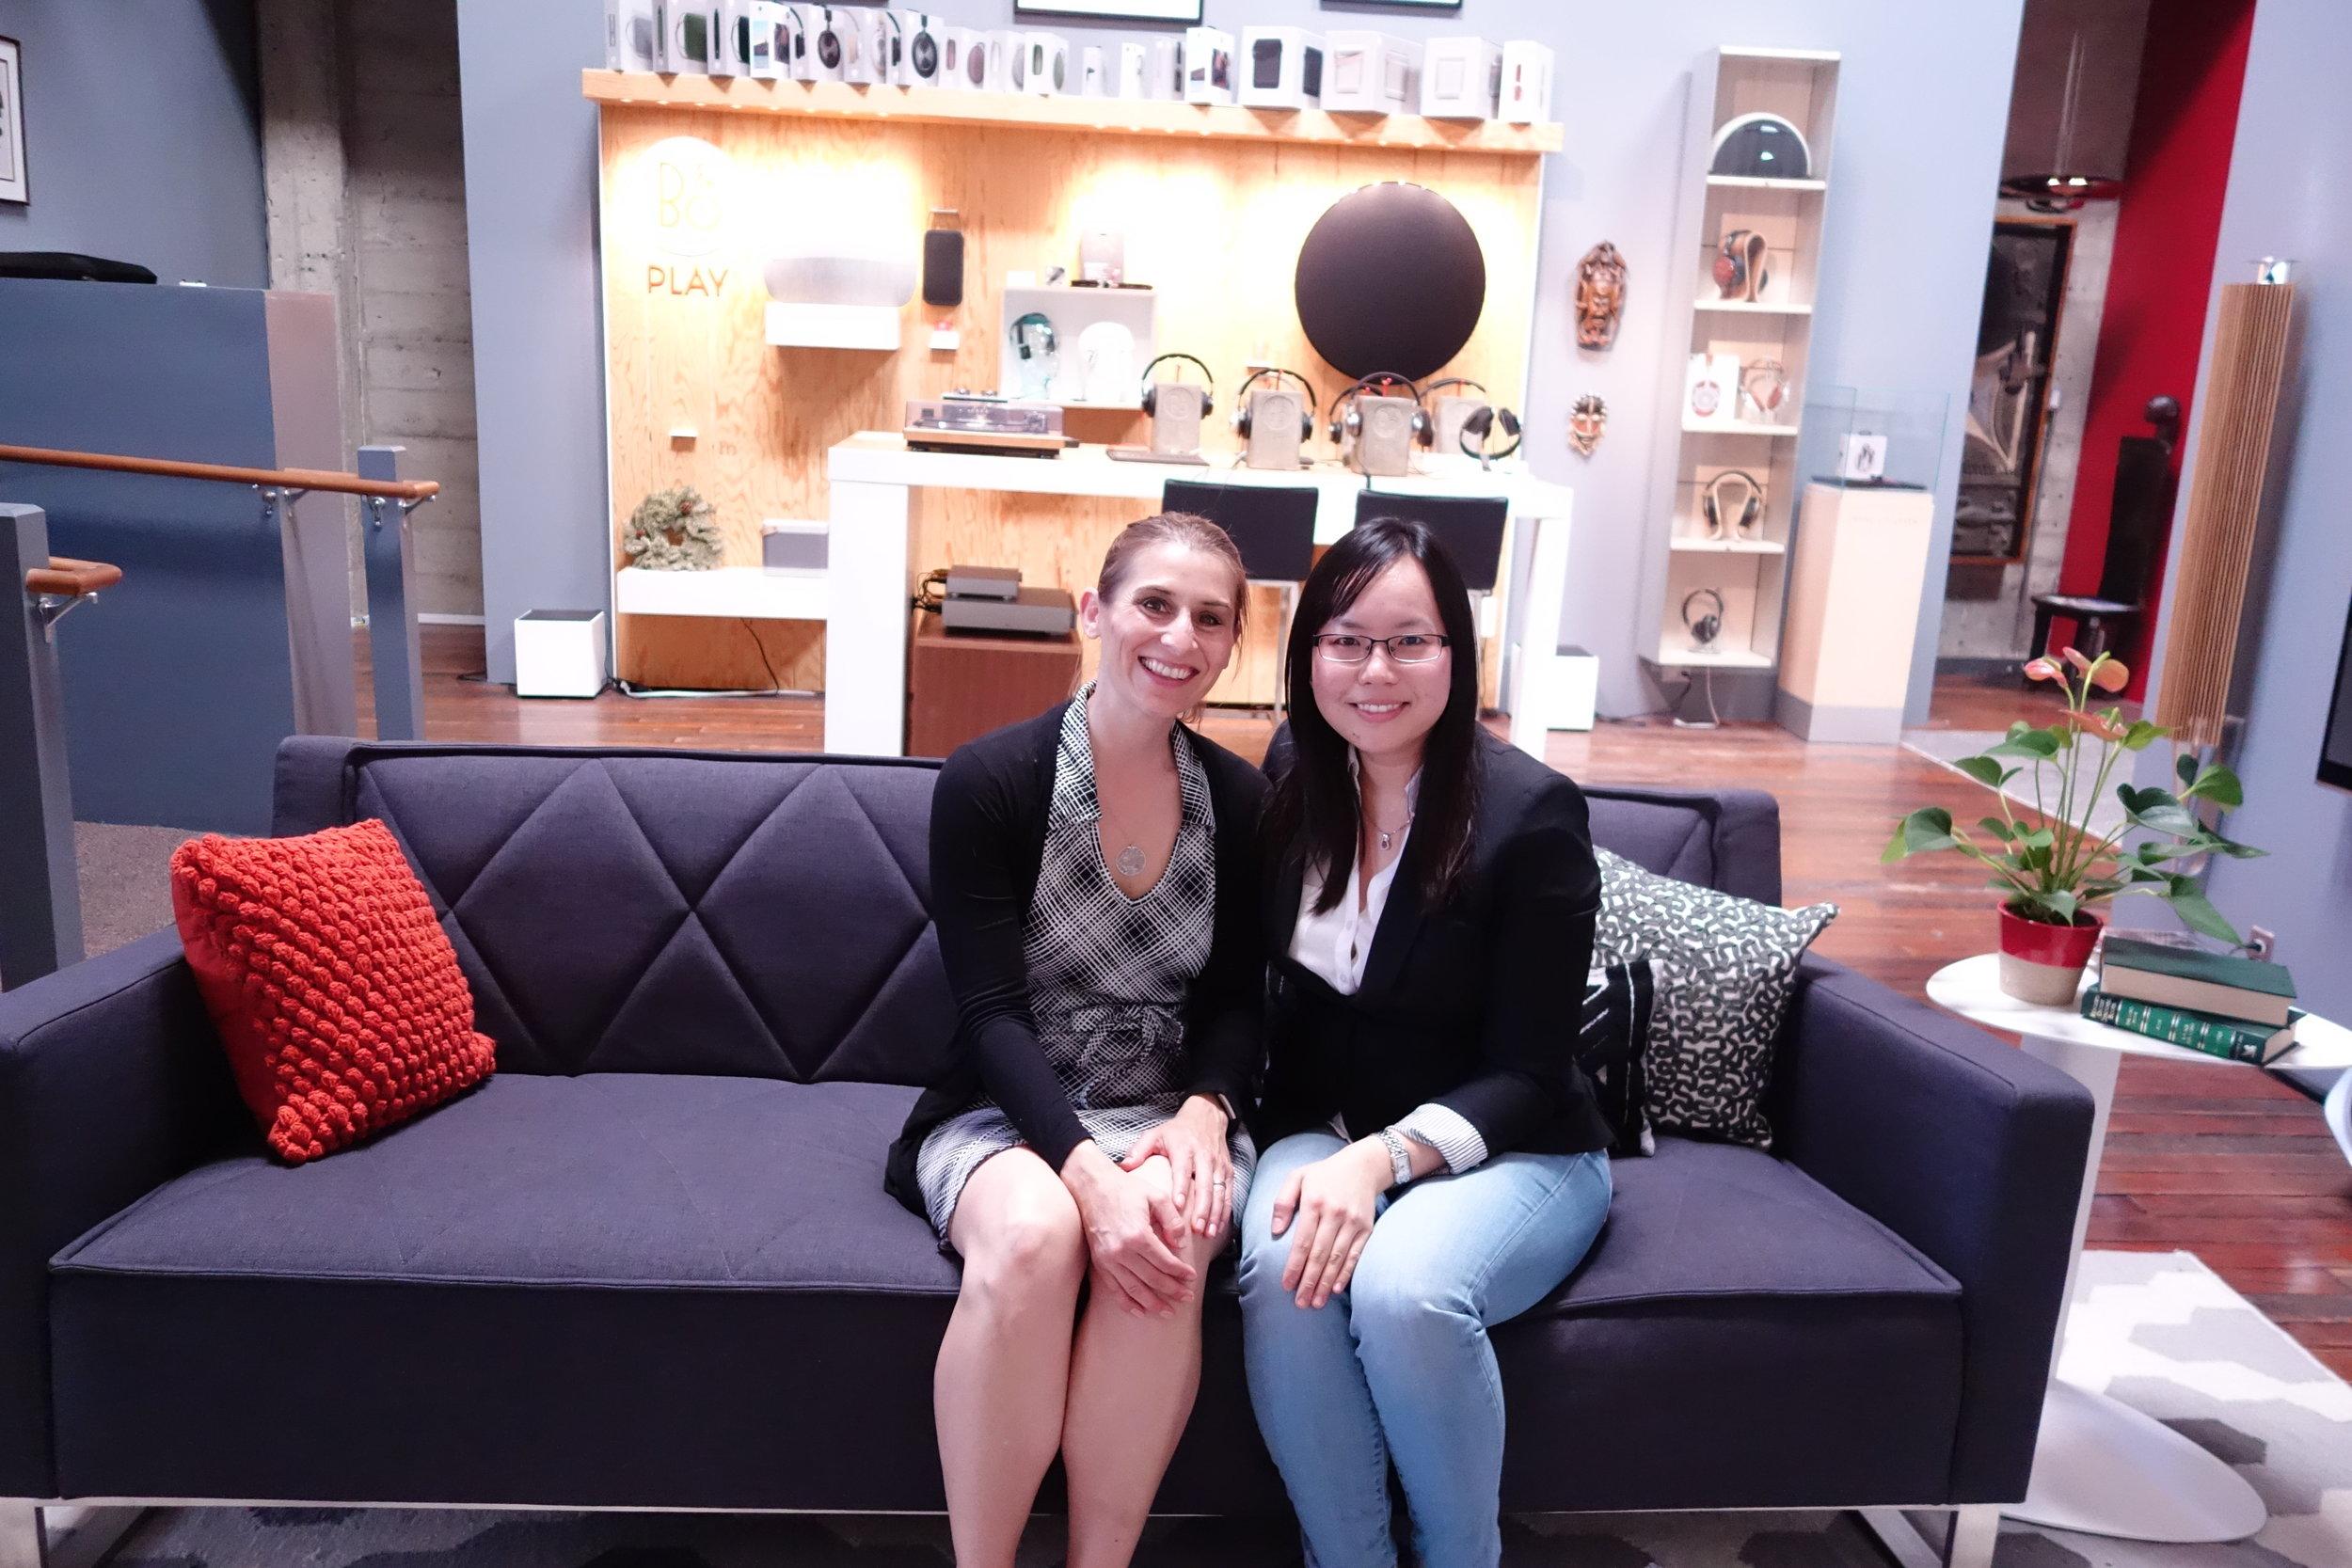 Kristie Middleton (Left) & Sandy Leung from SandyByTheBay.com food blog (Right).